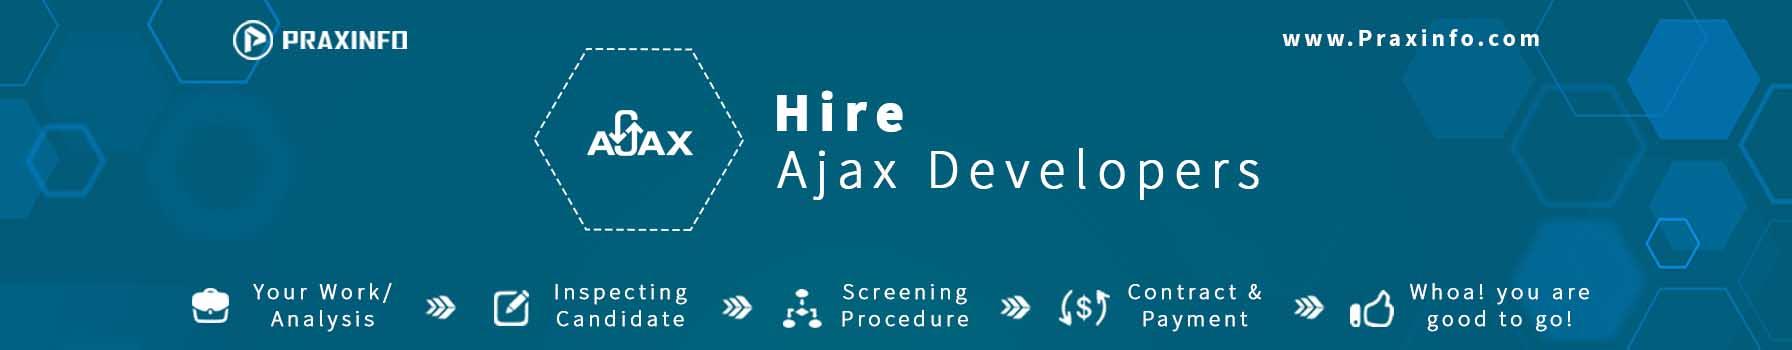 hire-Ajax-developer.jpg